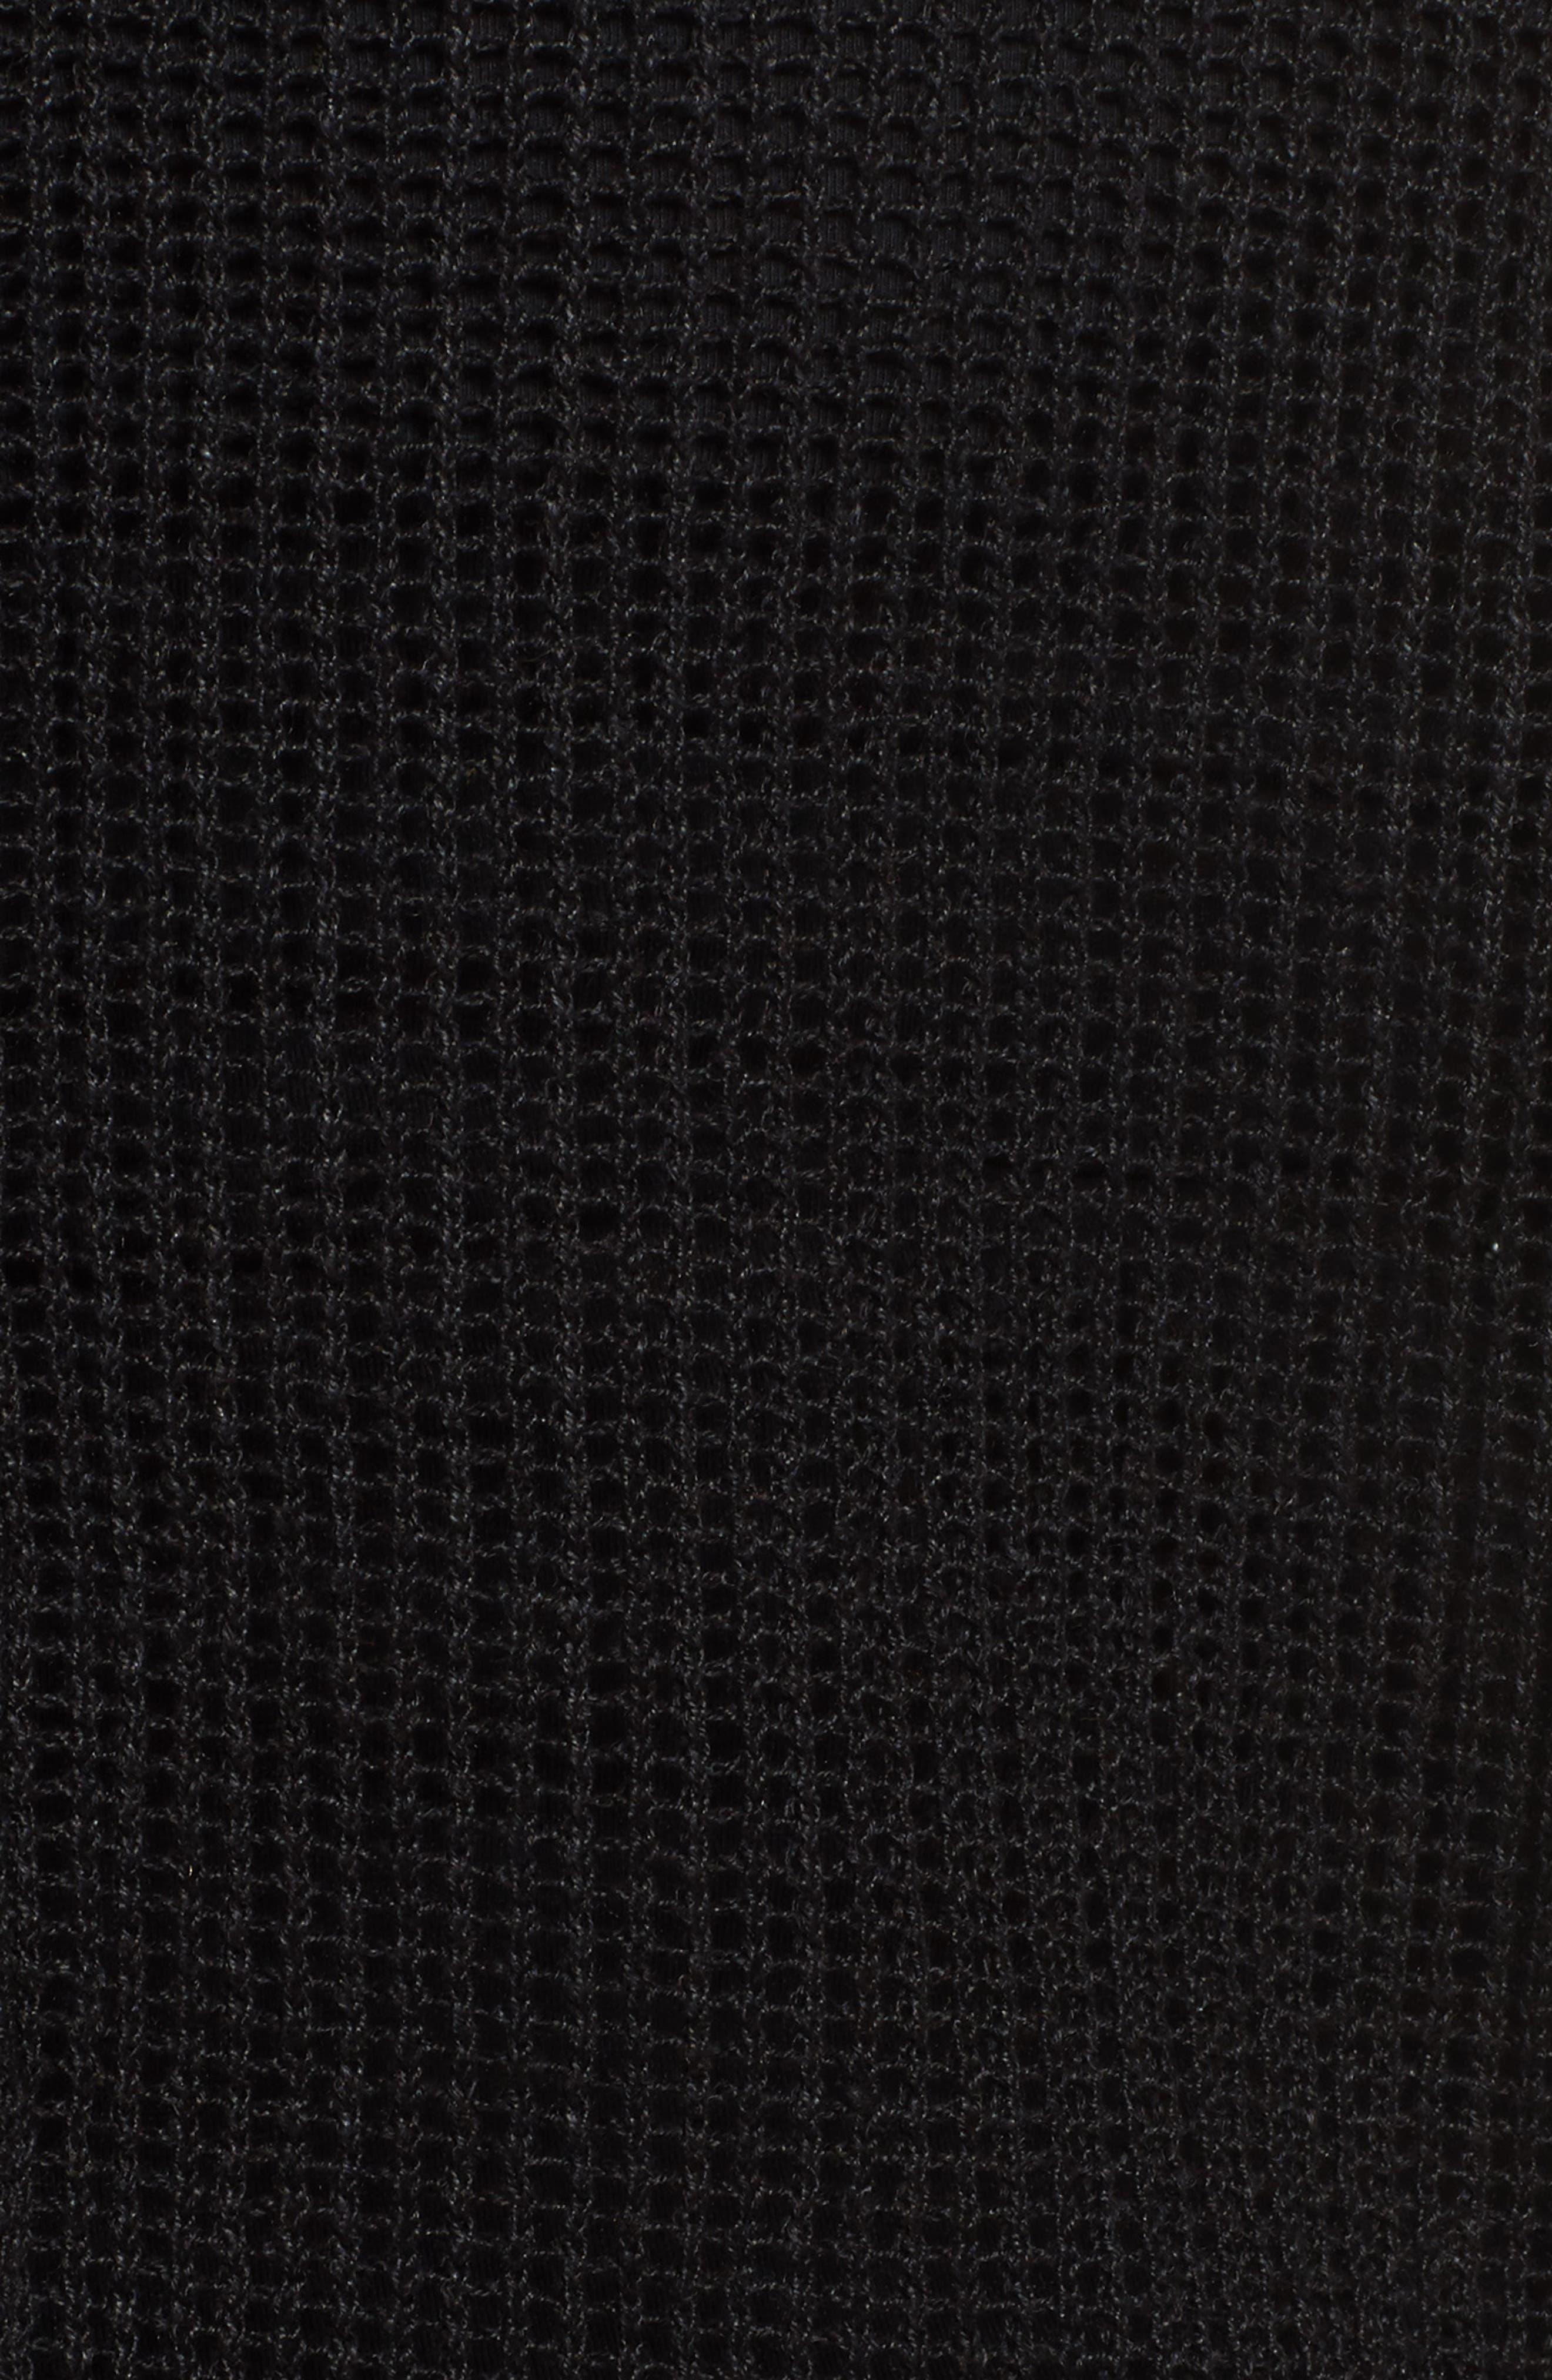 Organic Linen Mesh Knit Top,                             Alternate thumbnail 5, color,                             001